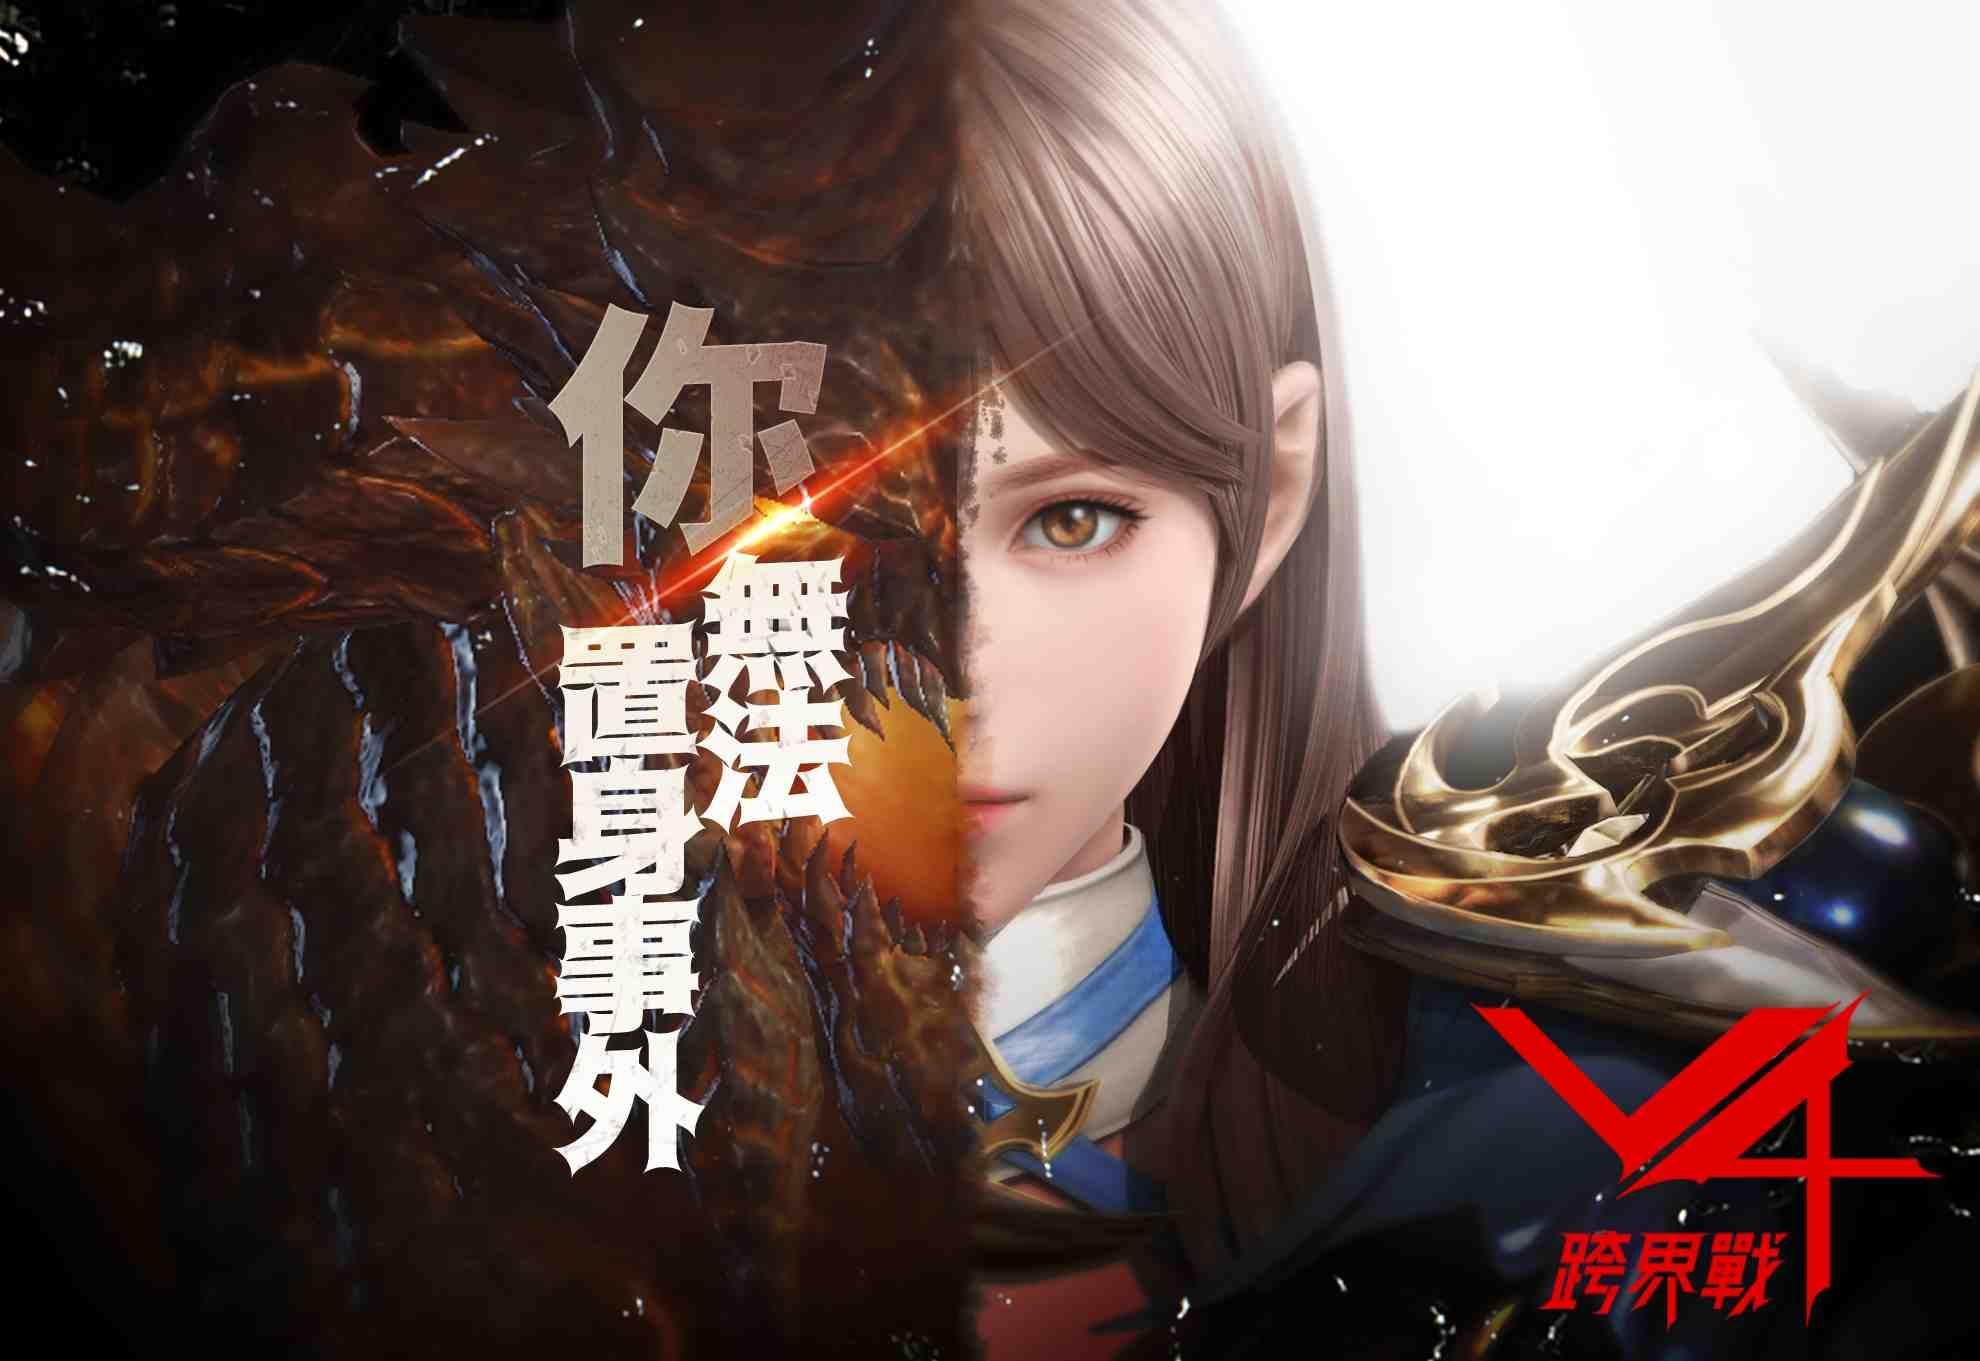 《V4:跨界戰》3月26日開戰! 最後三職業廣告同步公開!